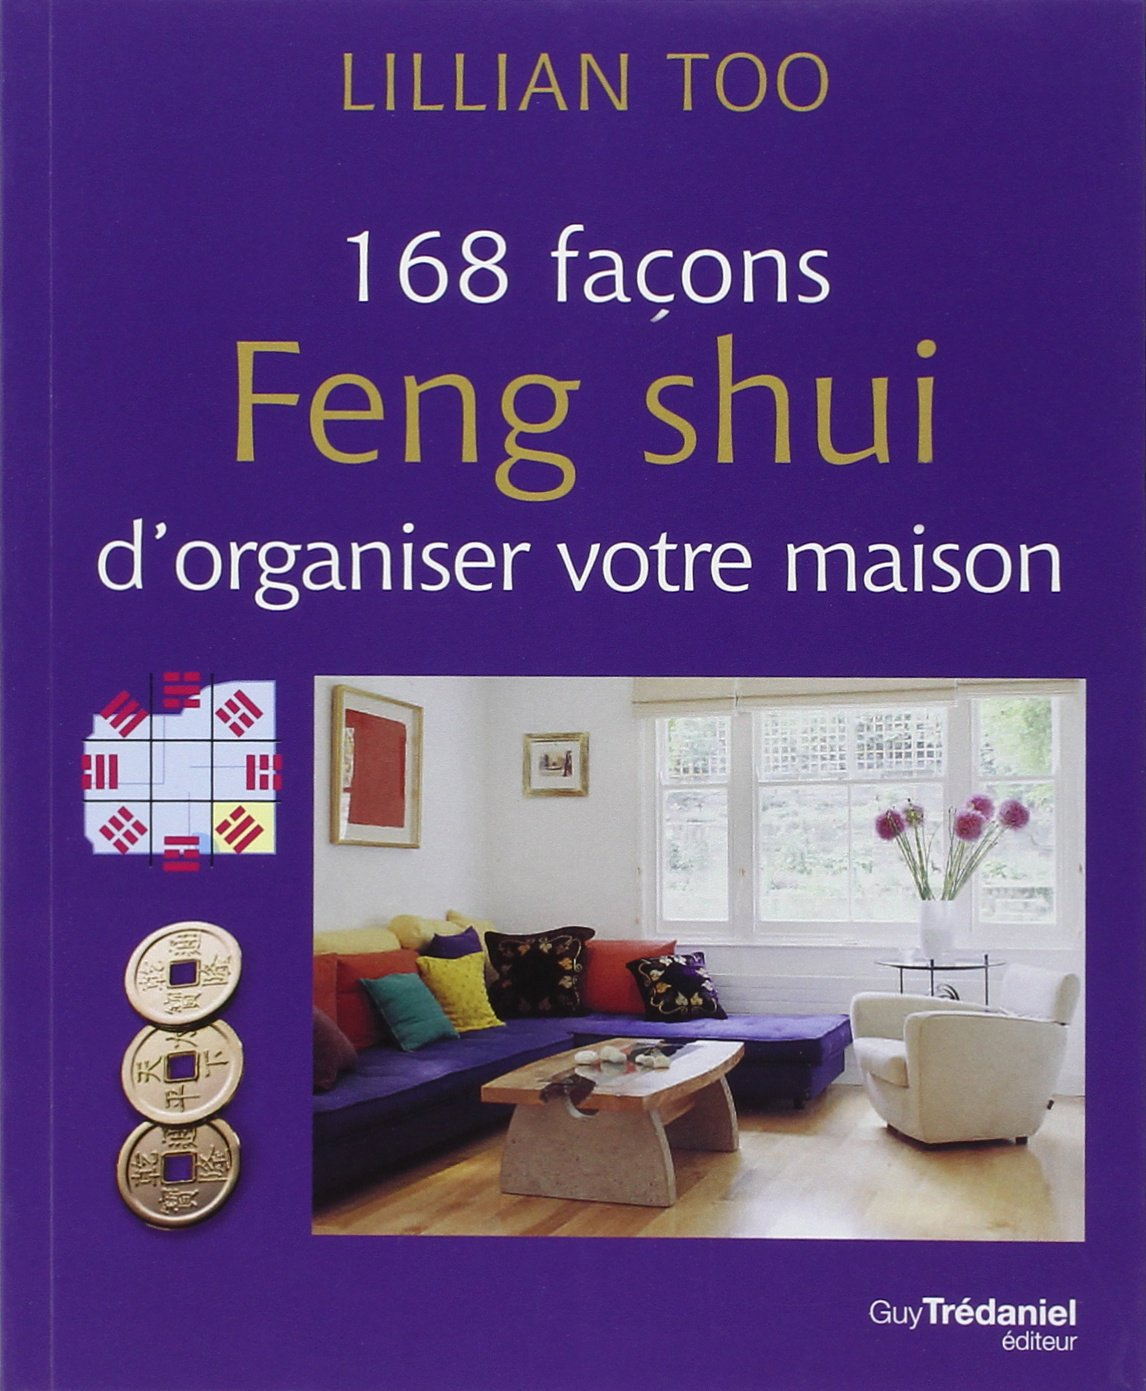 religions et spiritualit s achat en ligne de v tements. Black Bedroom Furniture Sets. Home Design Ideas